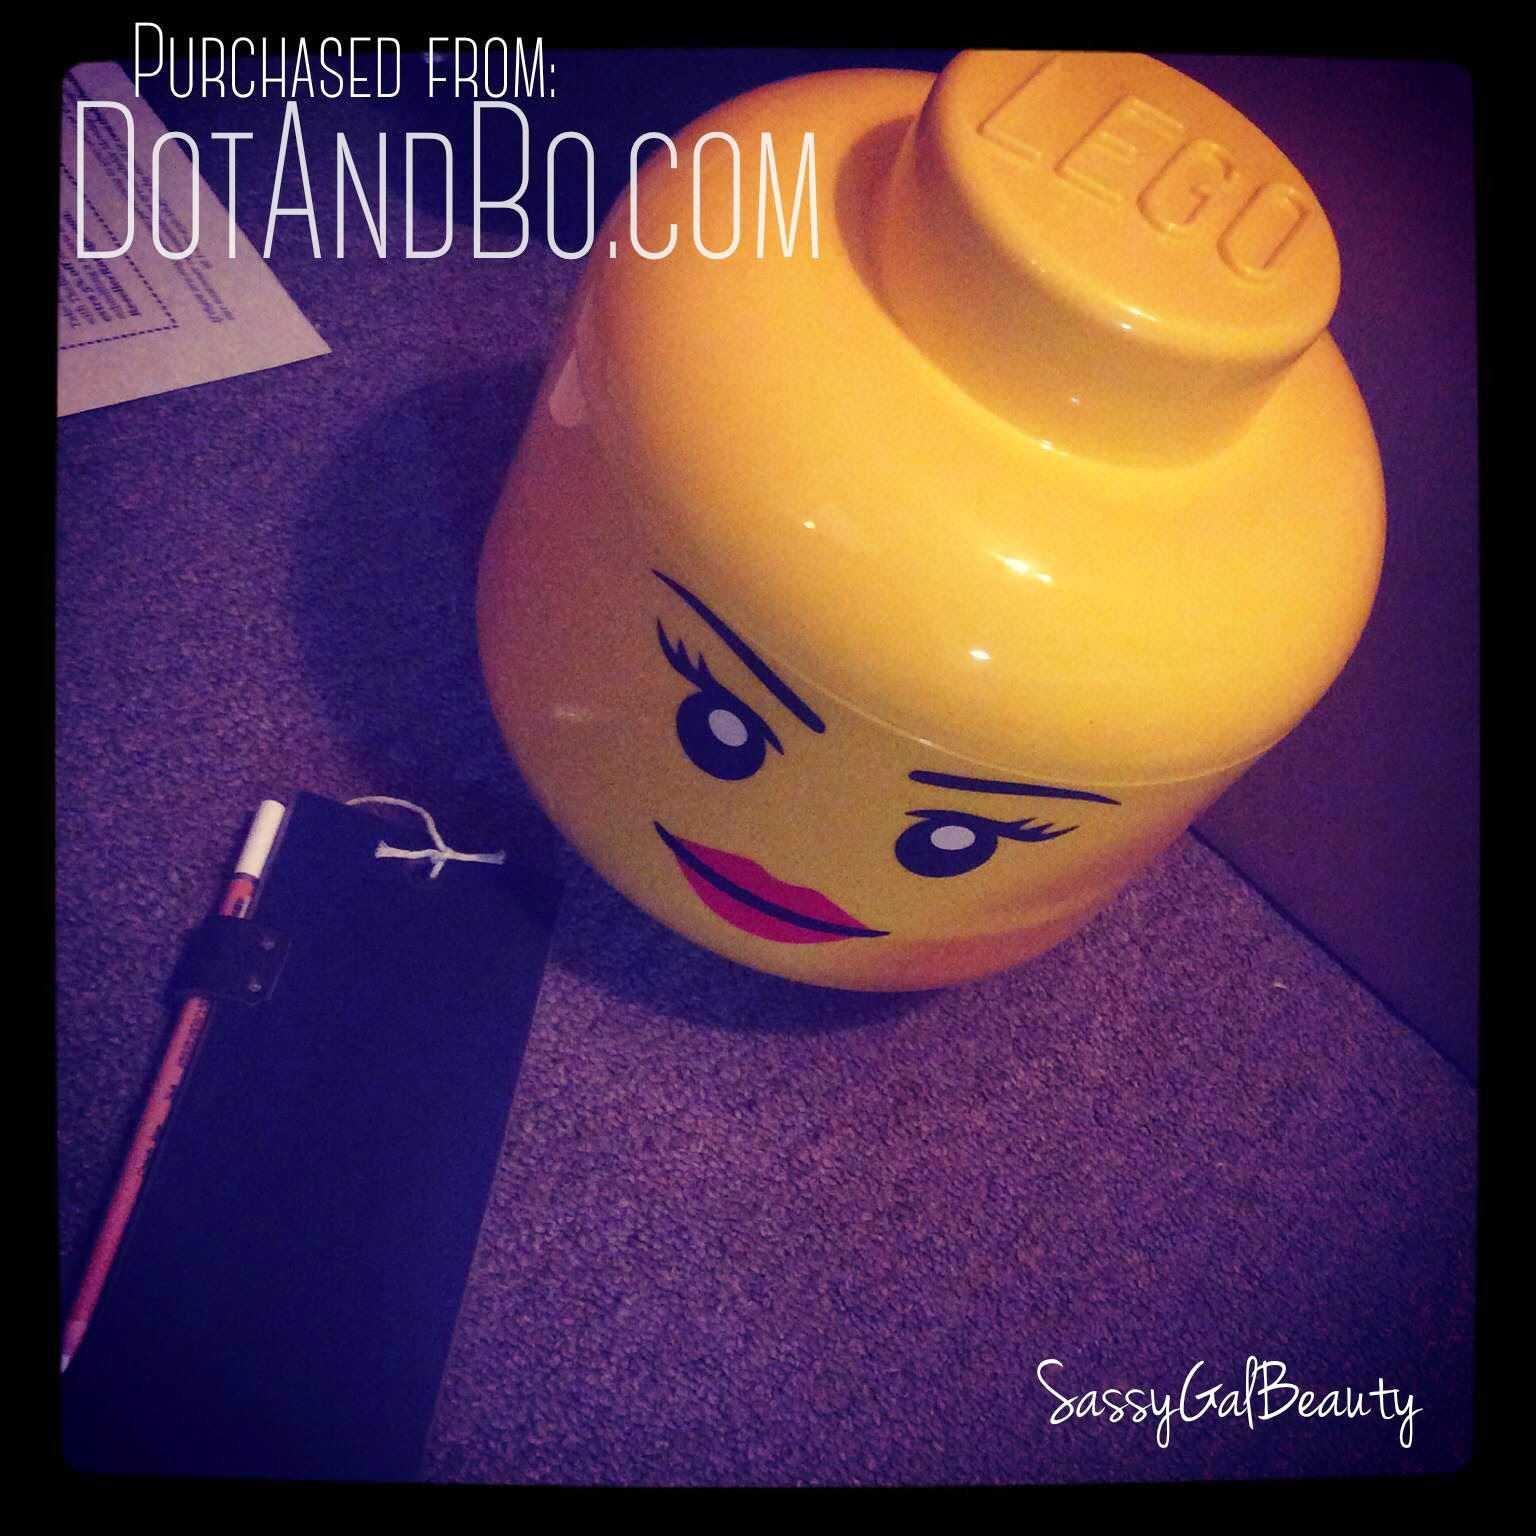 Lego Head and Chalkboard from DotandBo.com